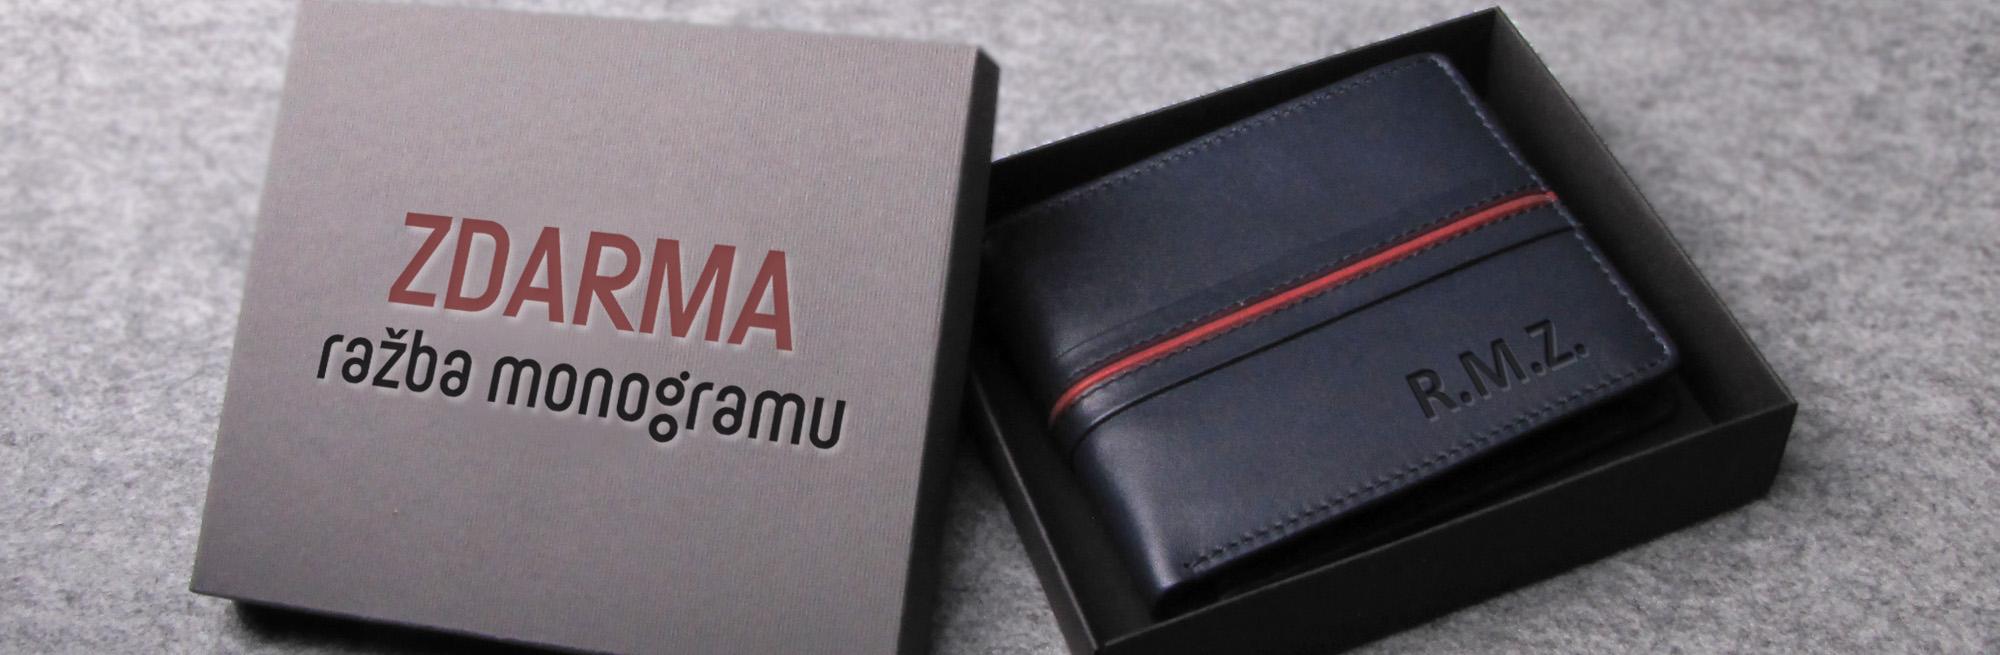 peněženka RED LINE ražba monogramu zdarma